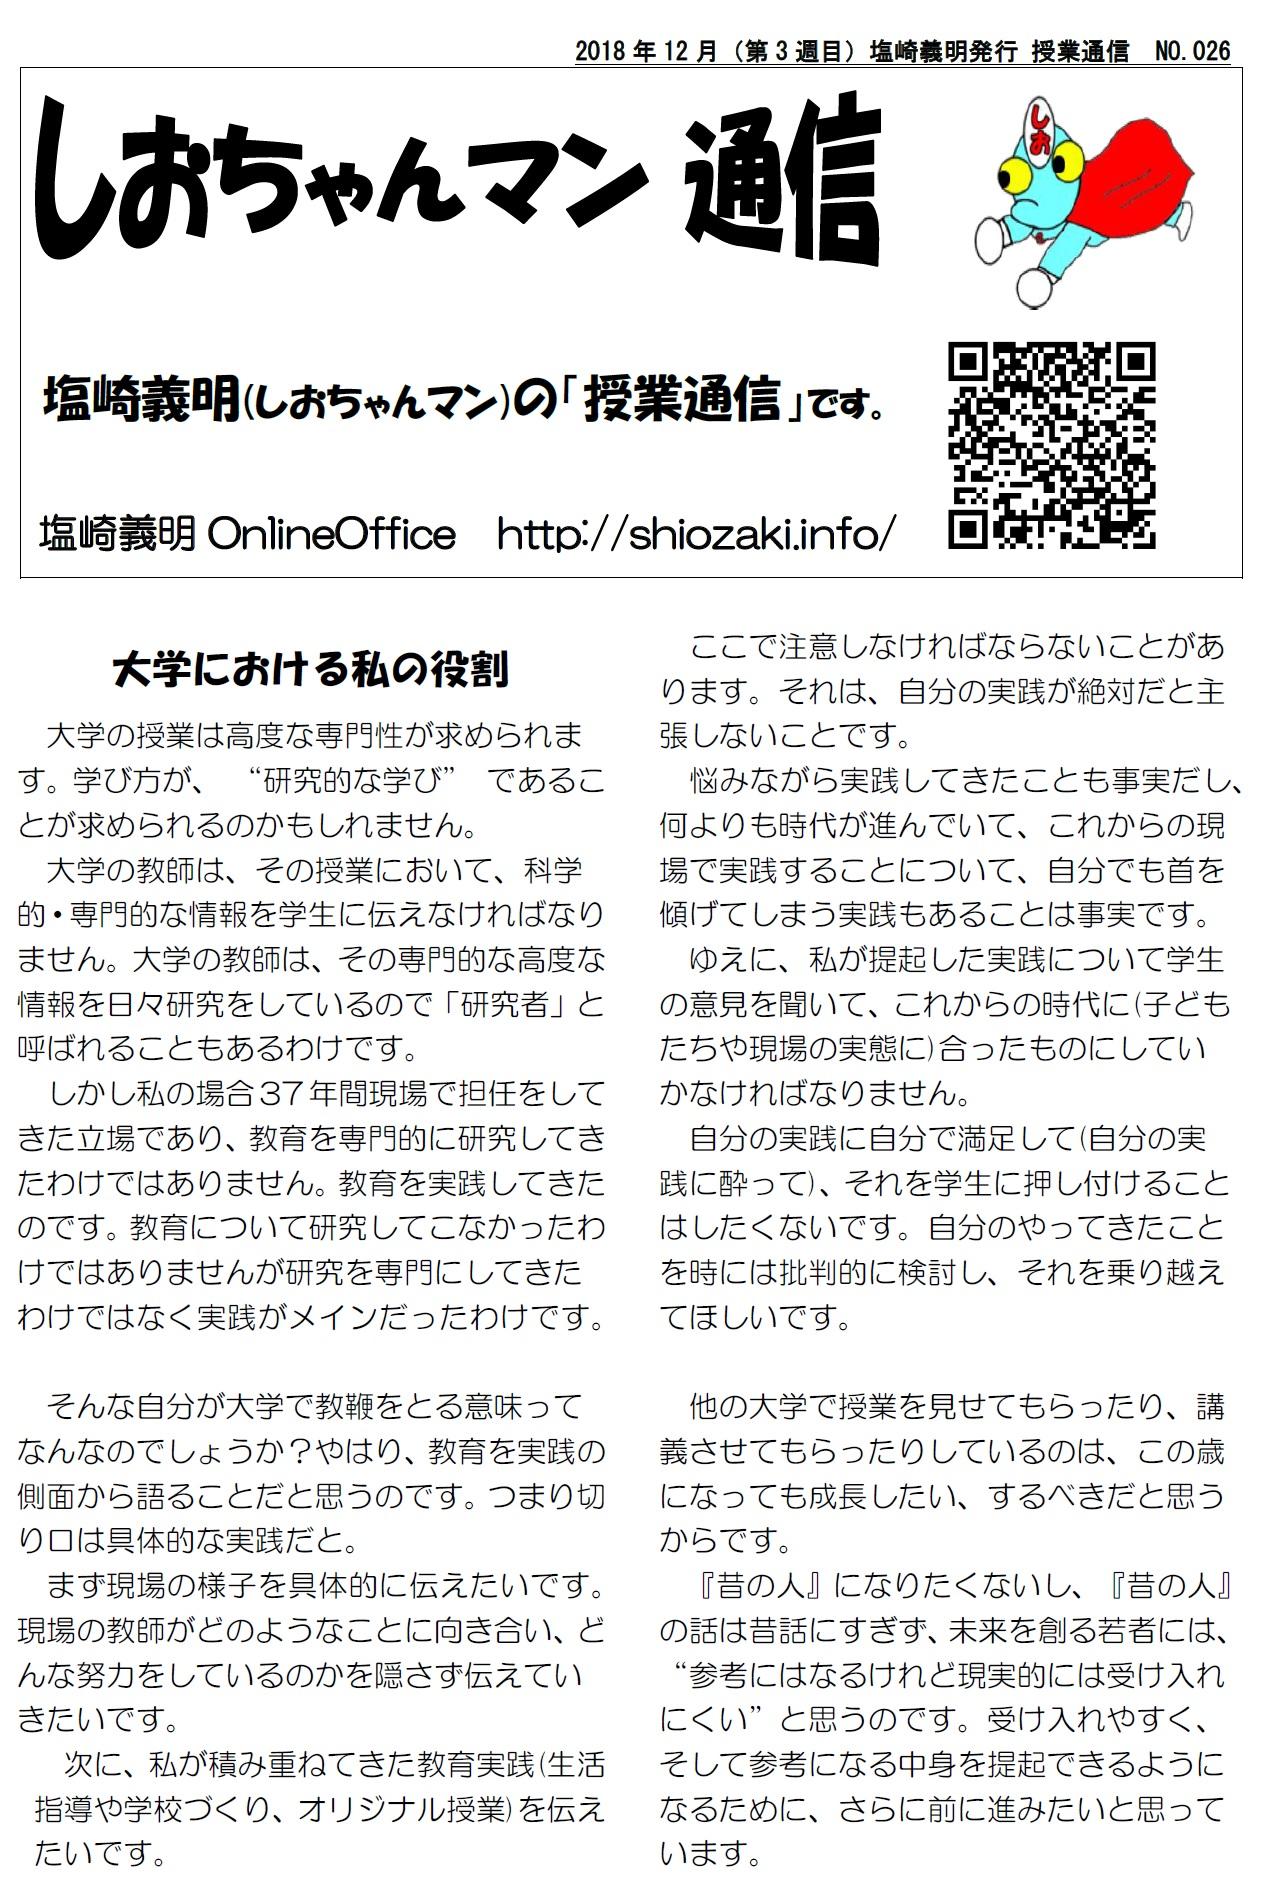 shio_26.jpg